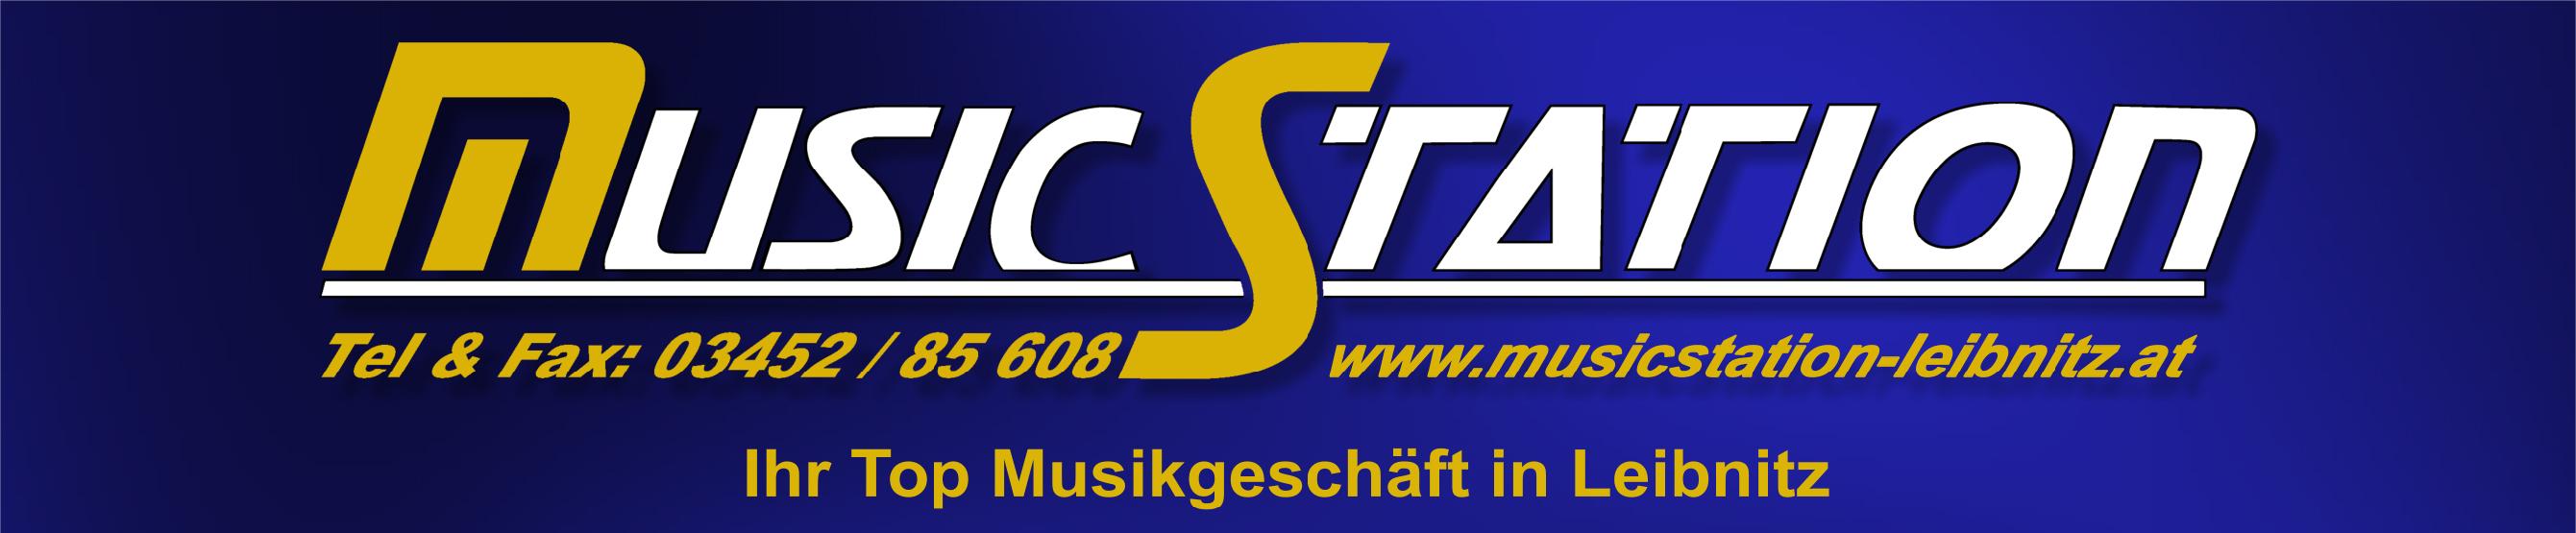 12_0_MusicStationCzermak